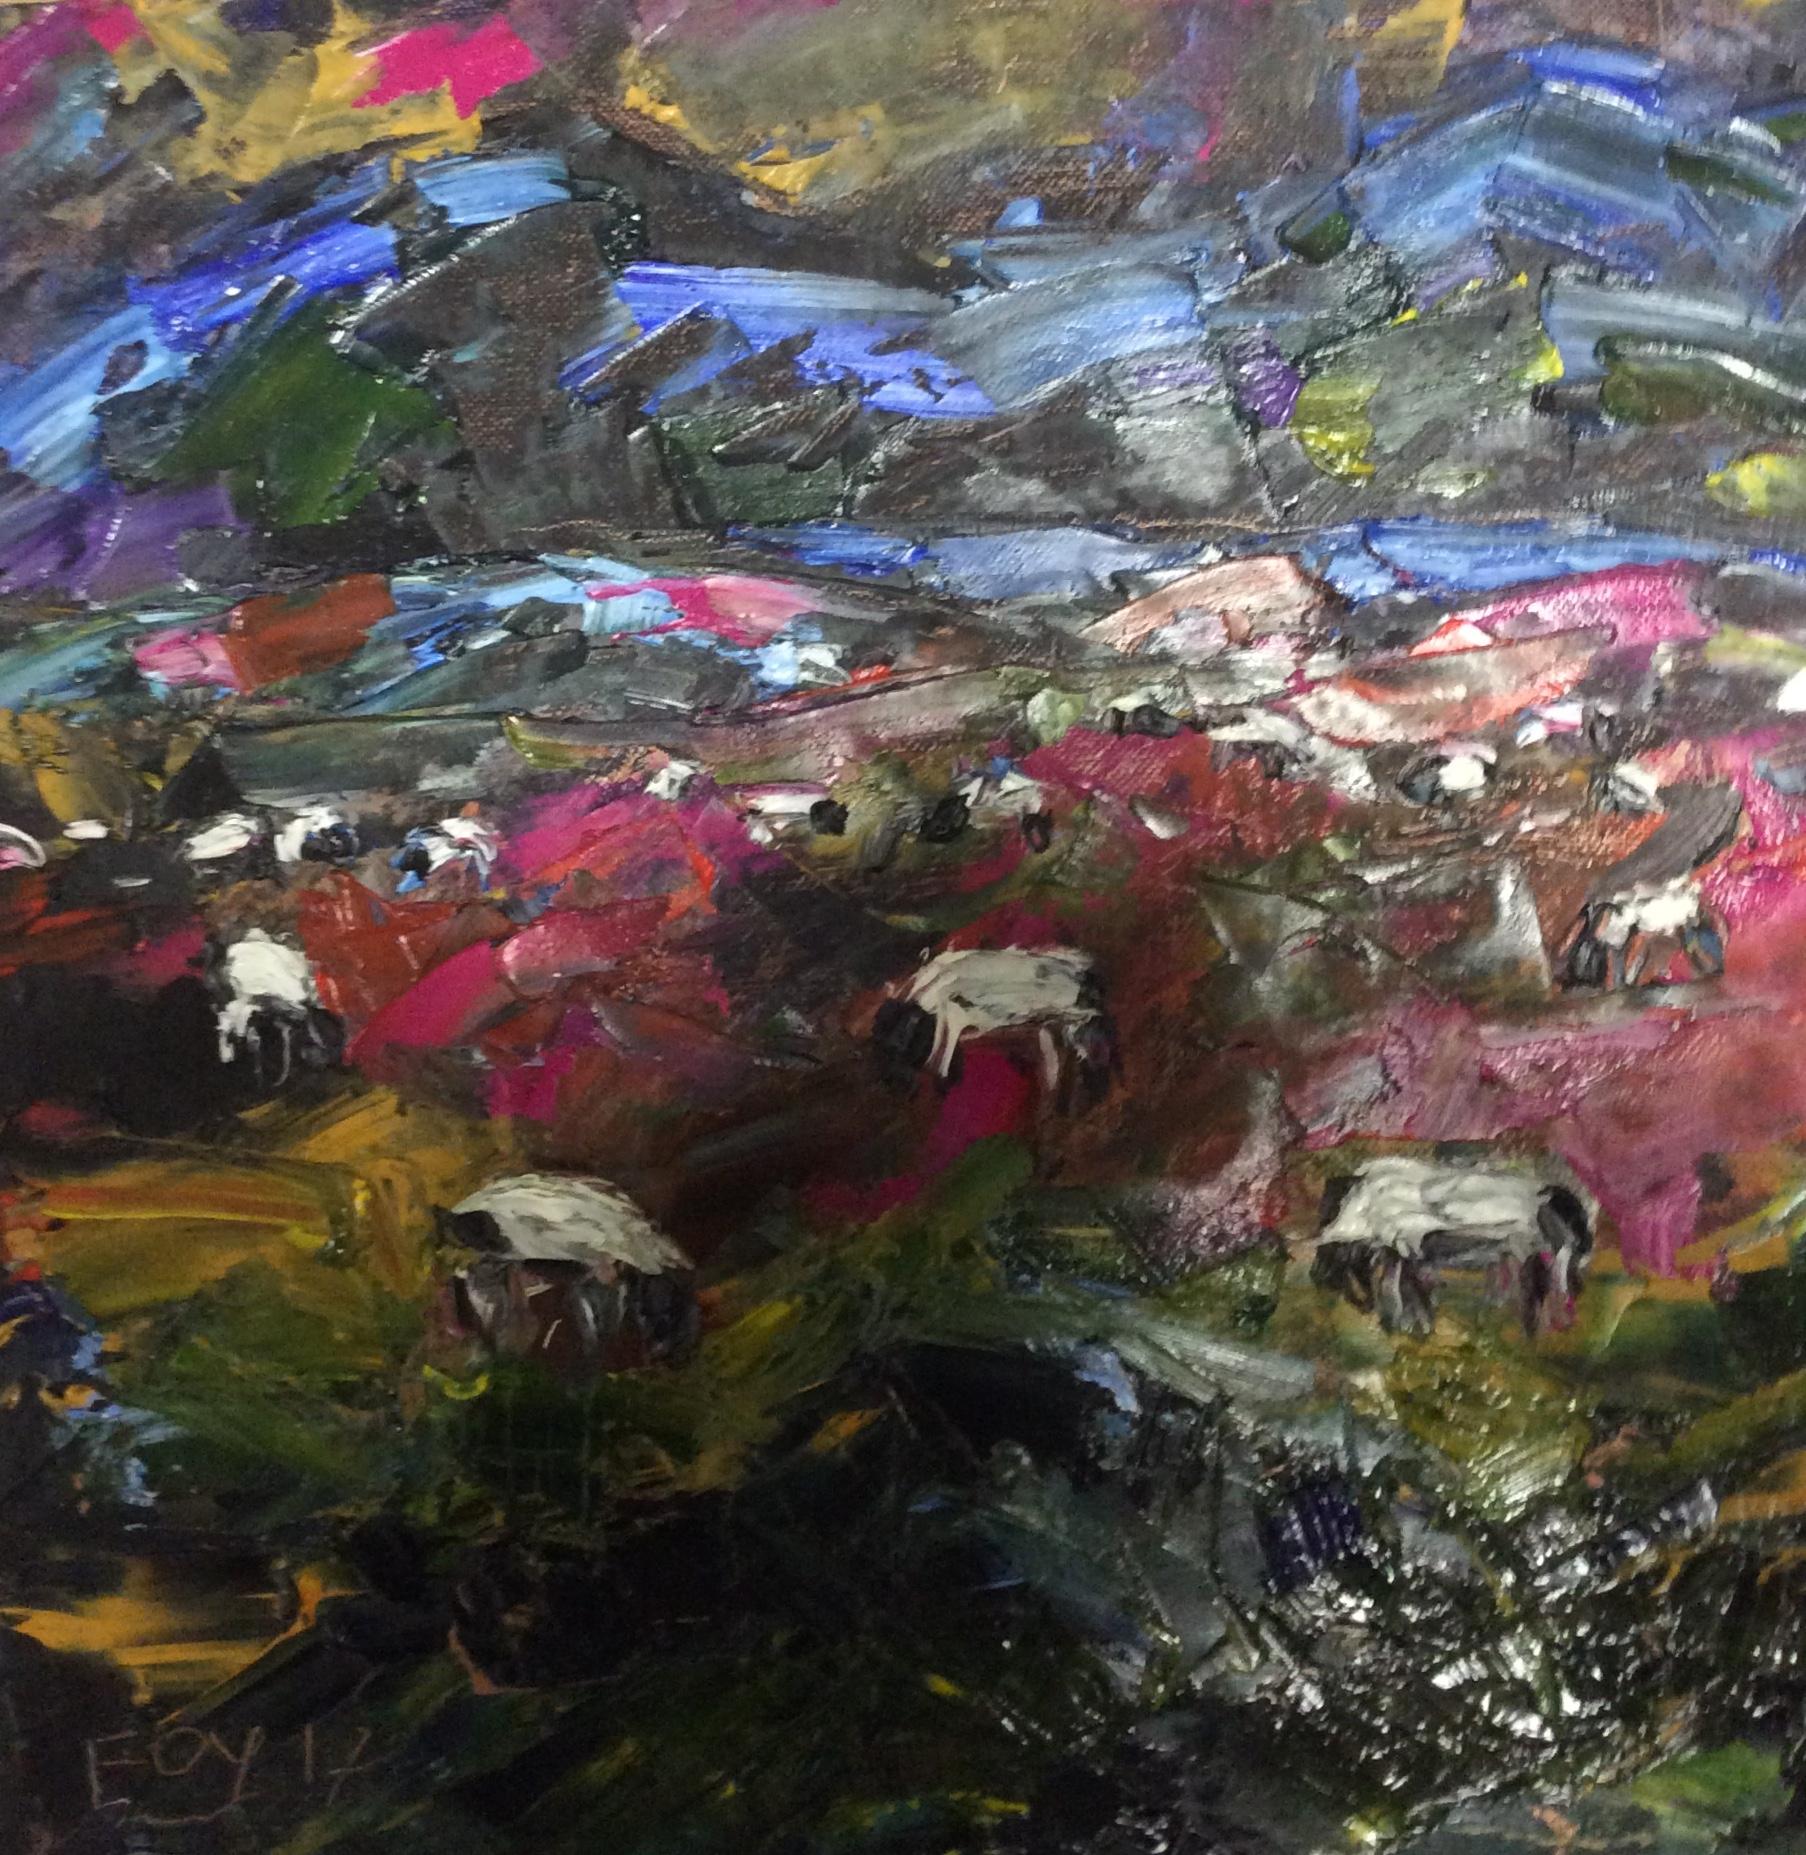 Sheep grazing. 12 x 12. Oil on panel.